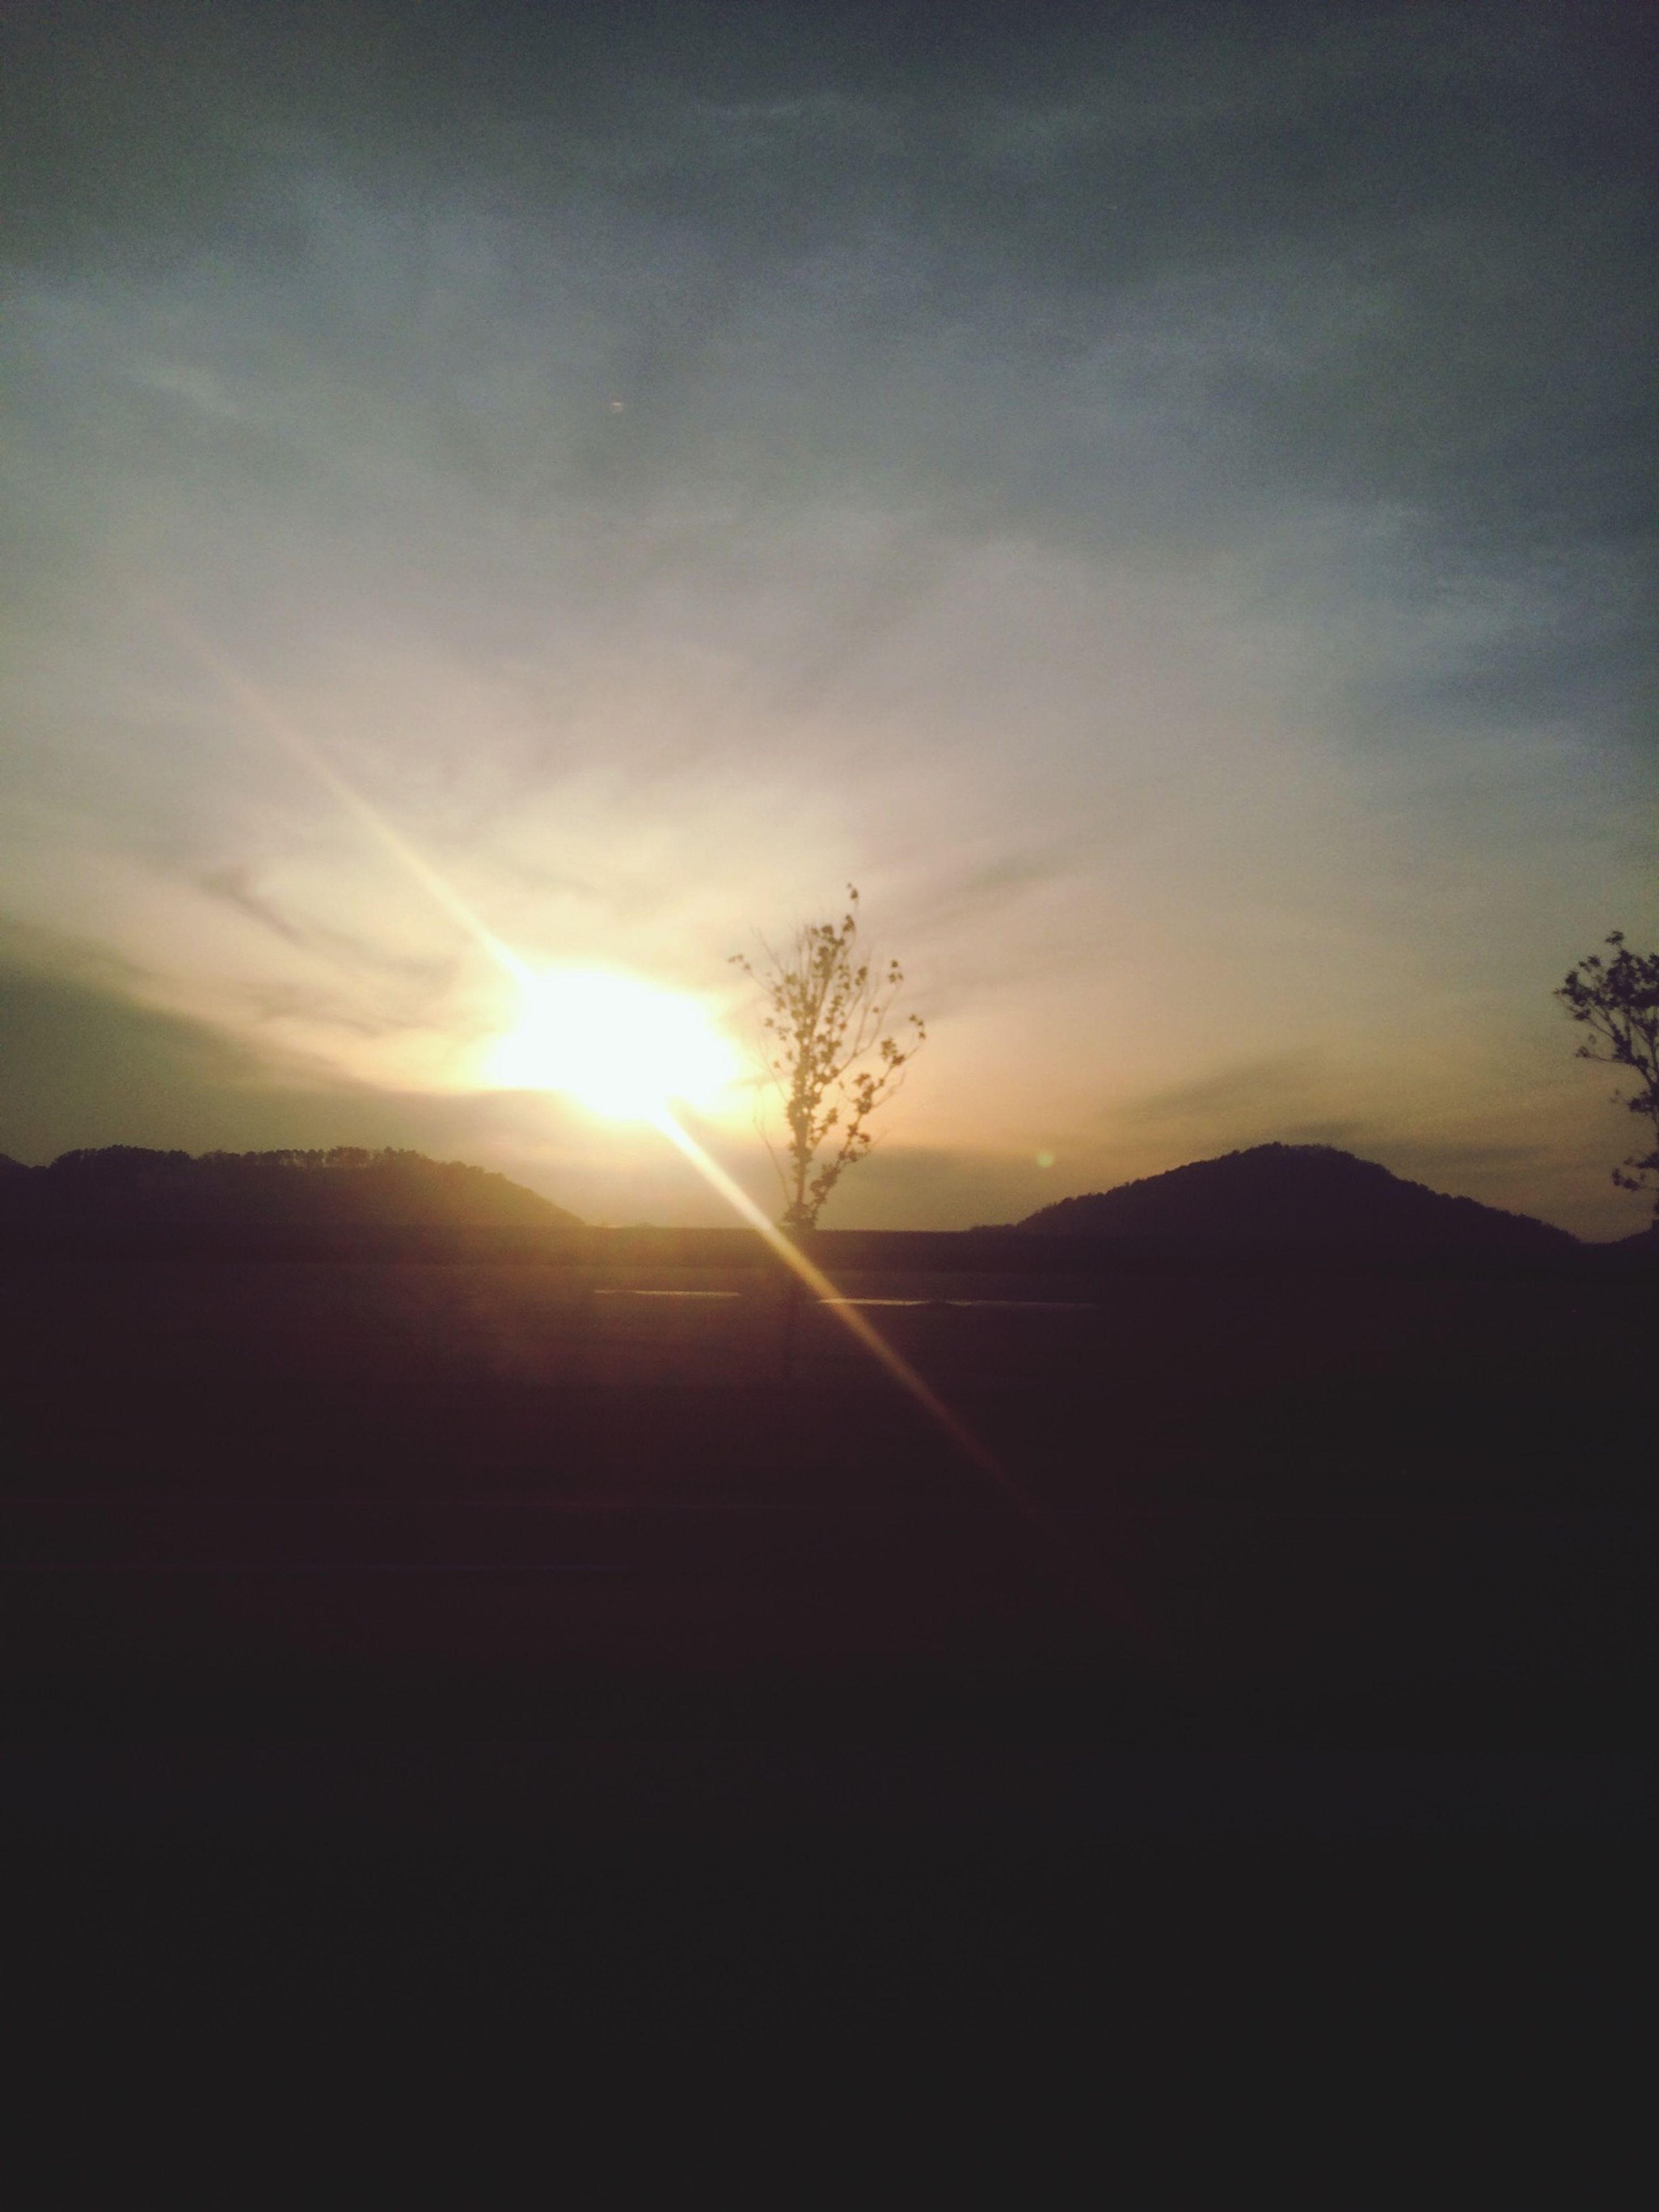 sunset, silhouette, sun, tranquil scene, tranquility, scenics, beauty in nature, mountain, landscape, sky, sunlight, nature, sunbeam, idyllic, mountain range, lens flare, non-urban scene, dark, outdoors, no people